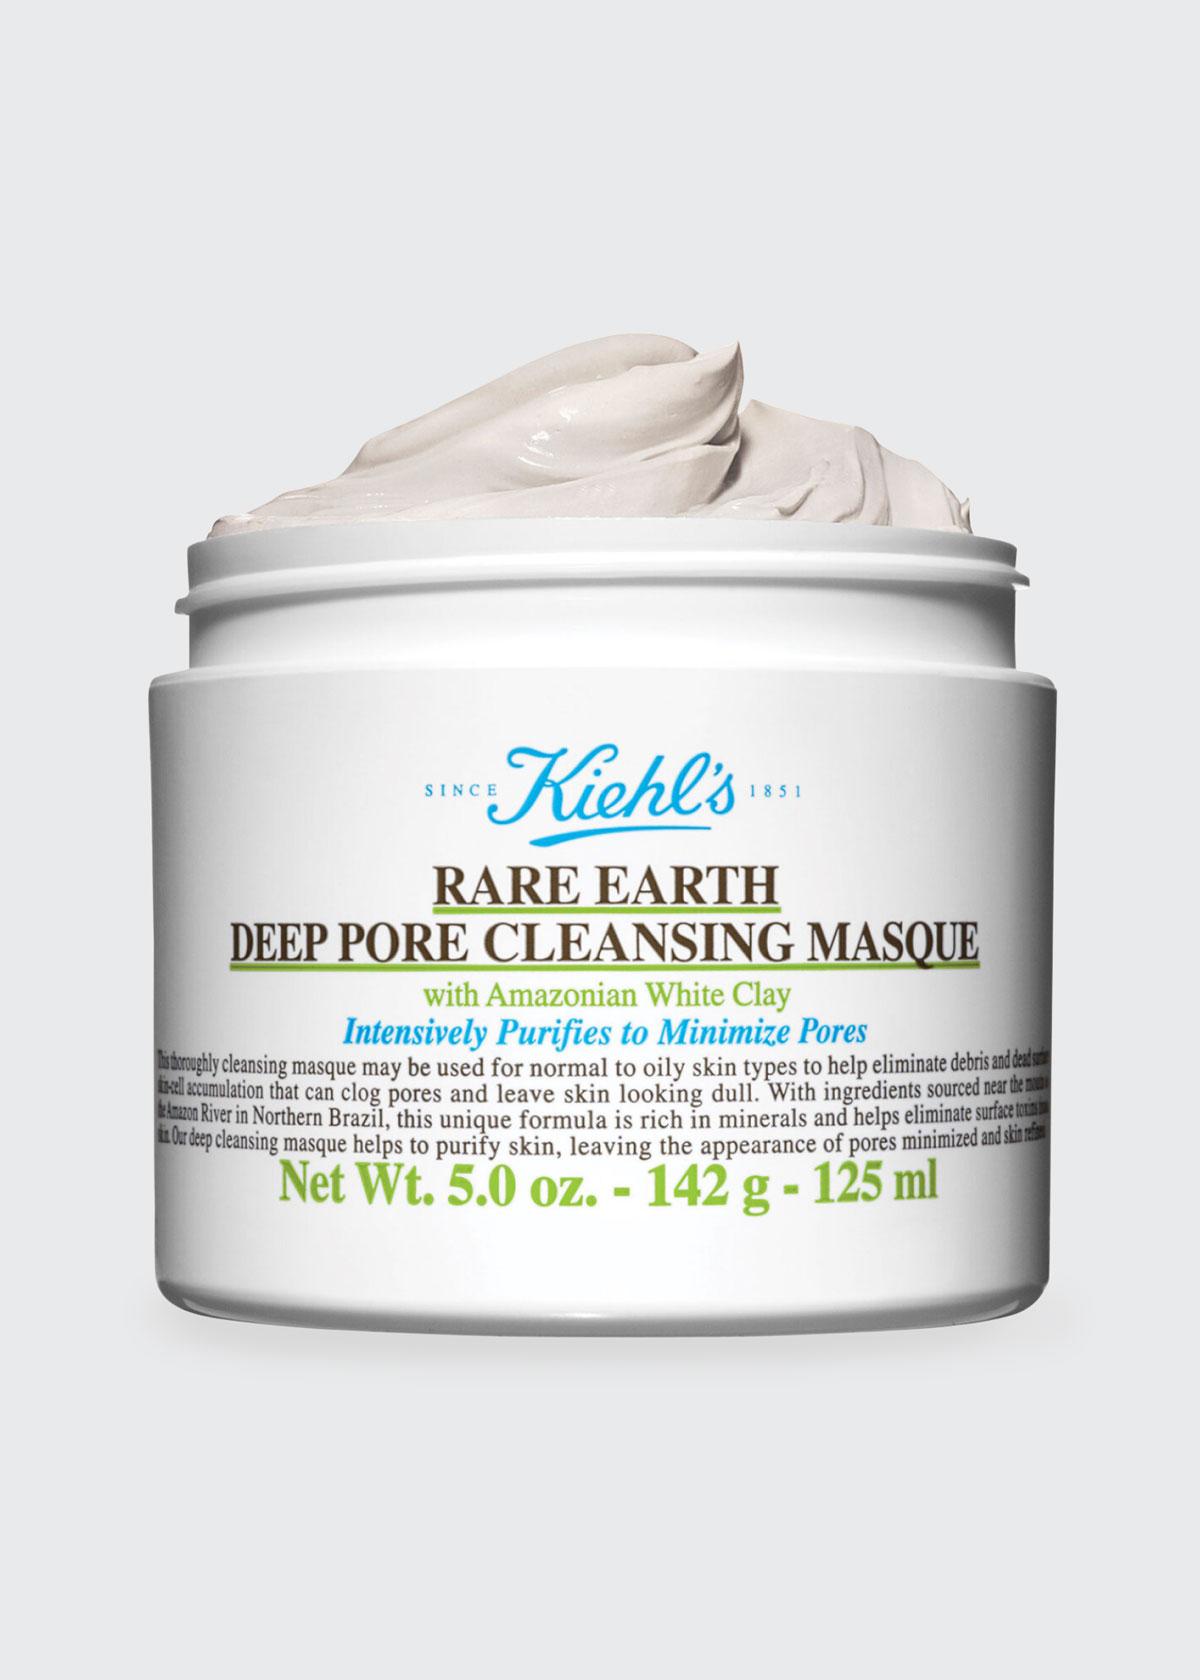 Kiehl's Since 1851 Rare Earth Deep Pore Cleansing Masque, 5.0 oz.